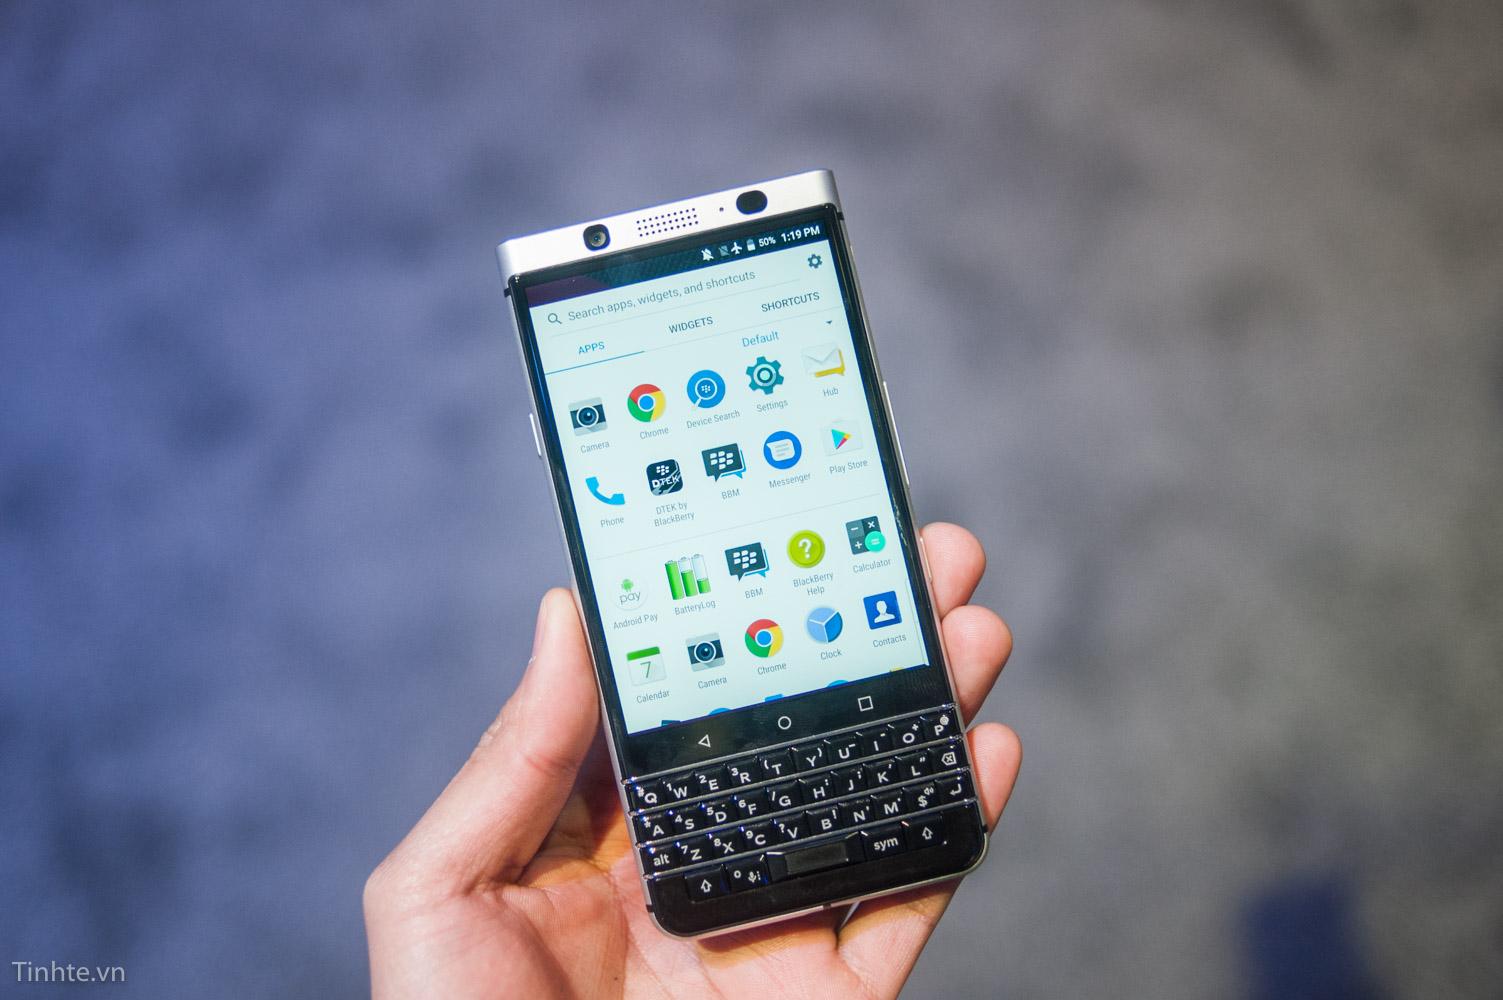 blackberry_mercury_tinhte.vn-6.jpg